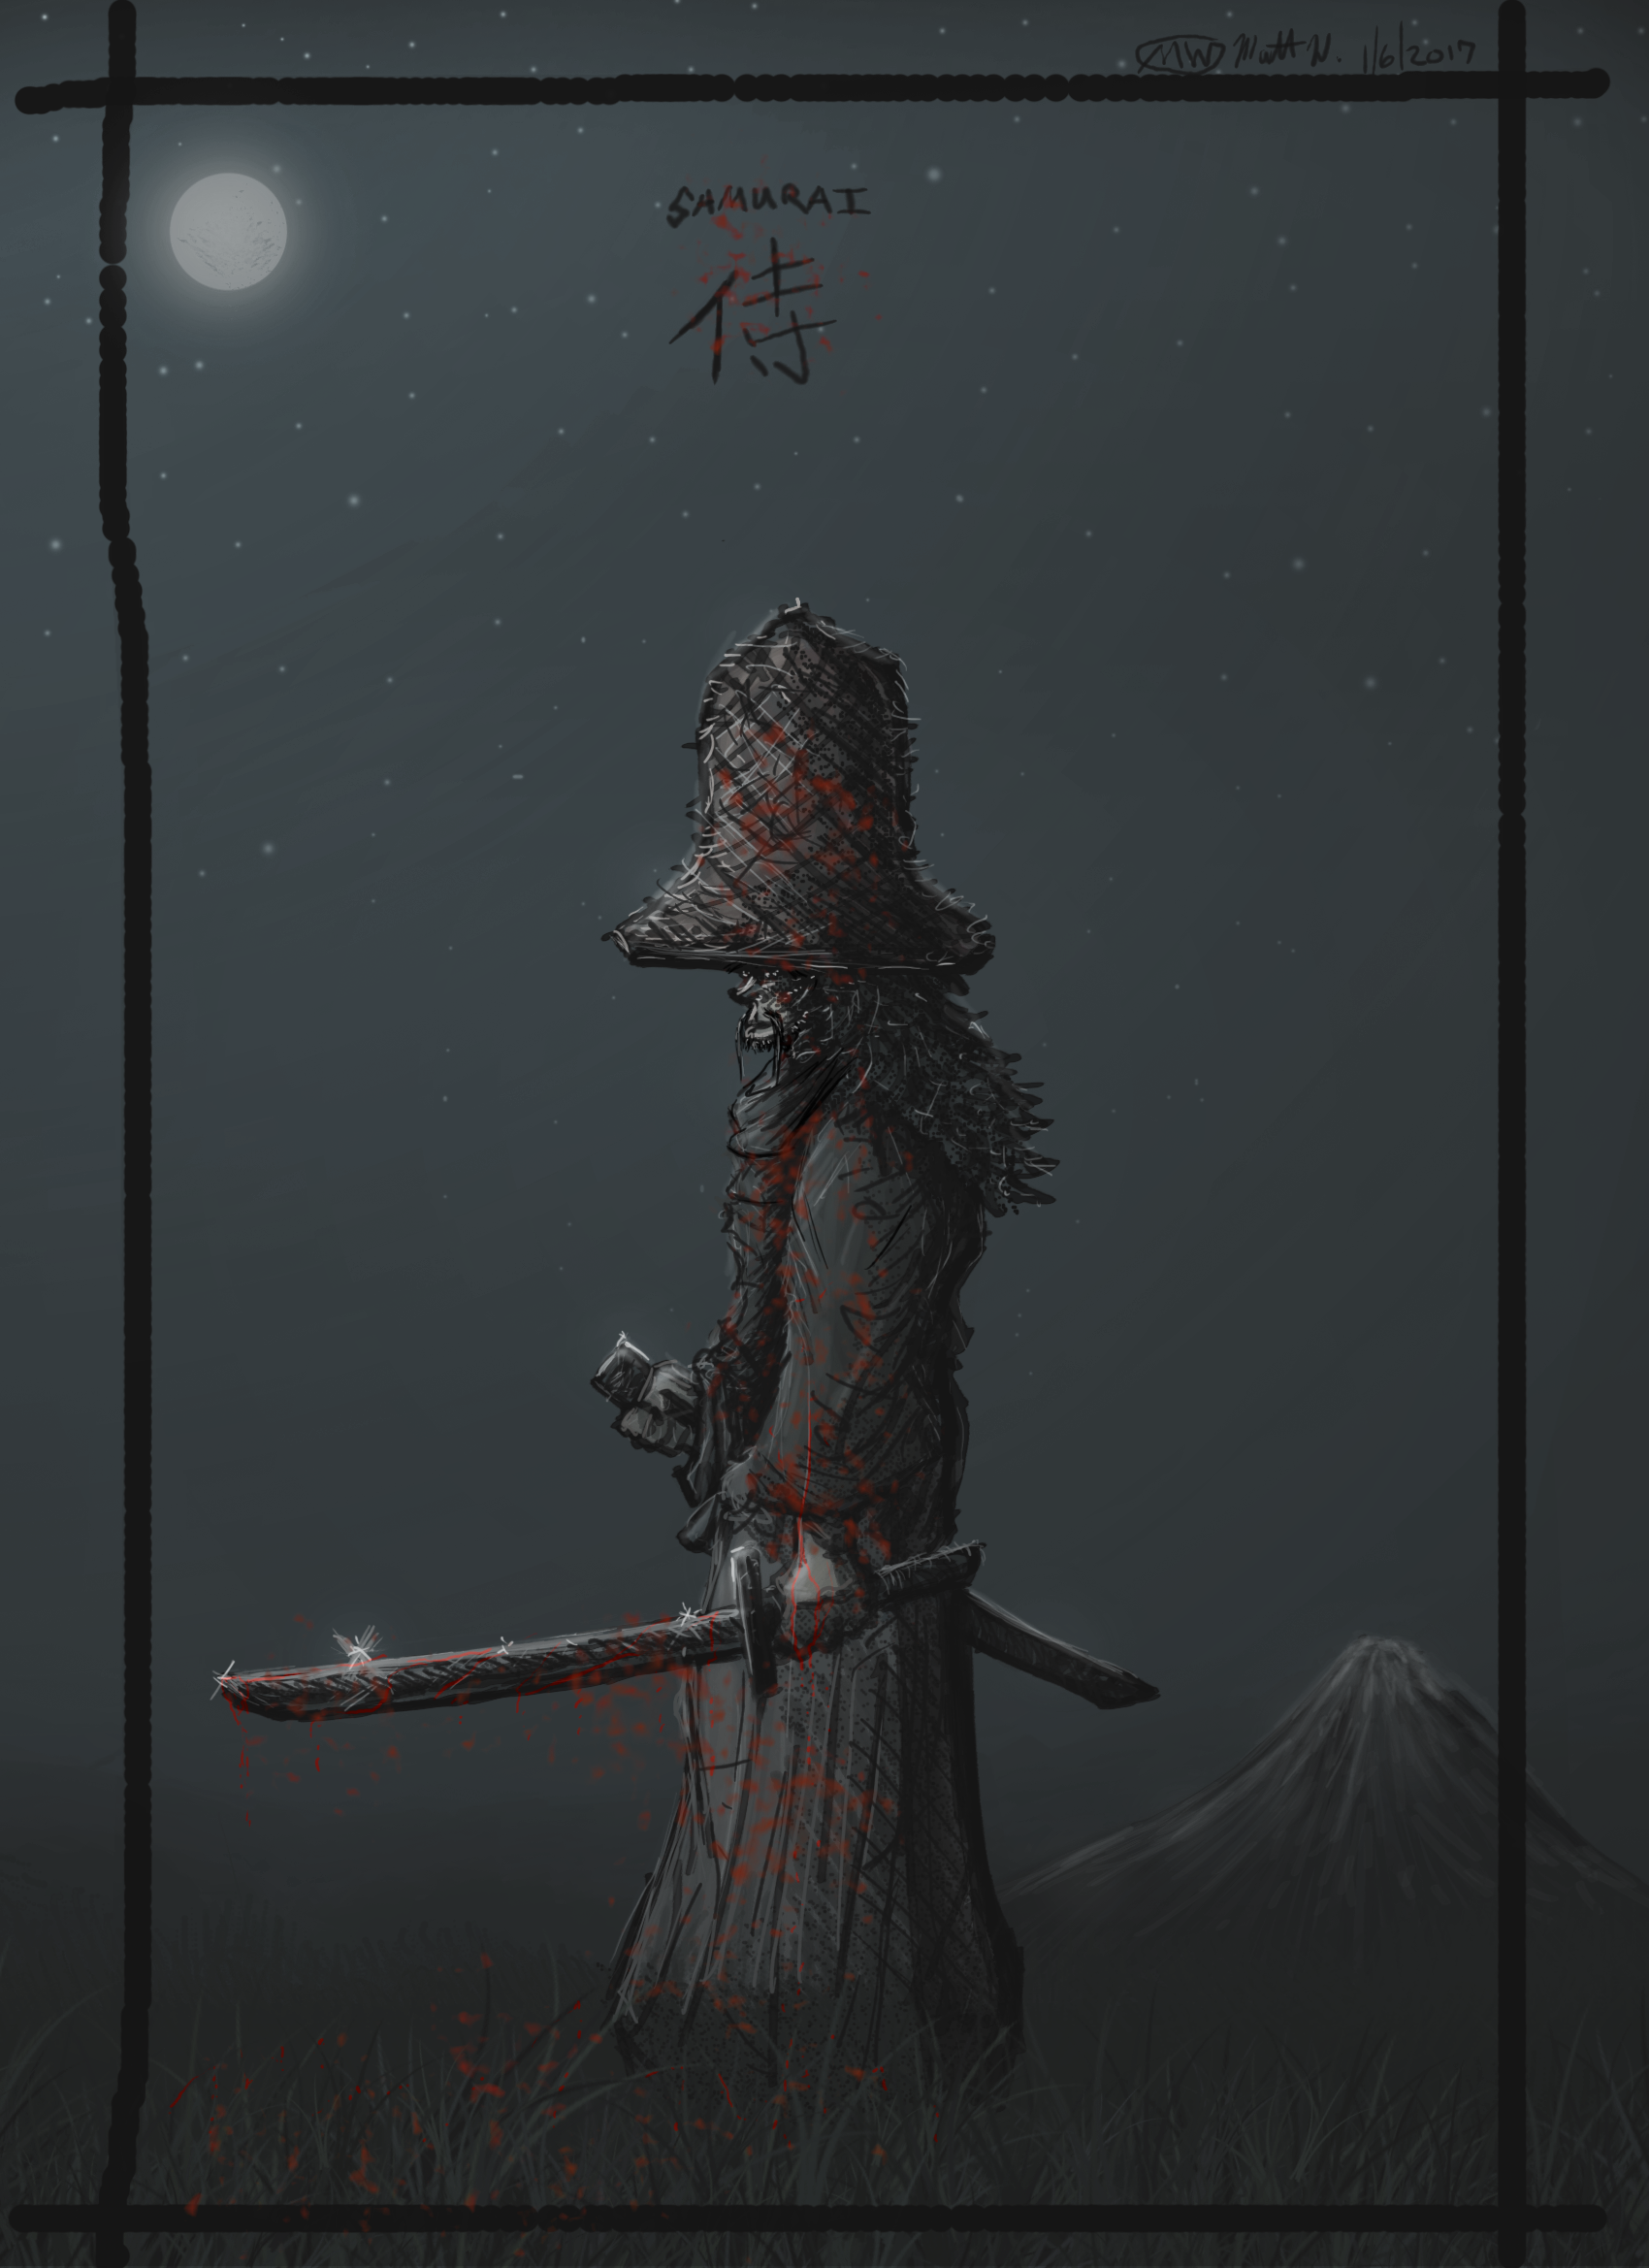 MW Samurai - big hat